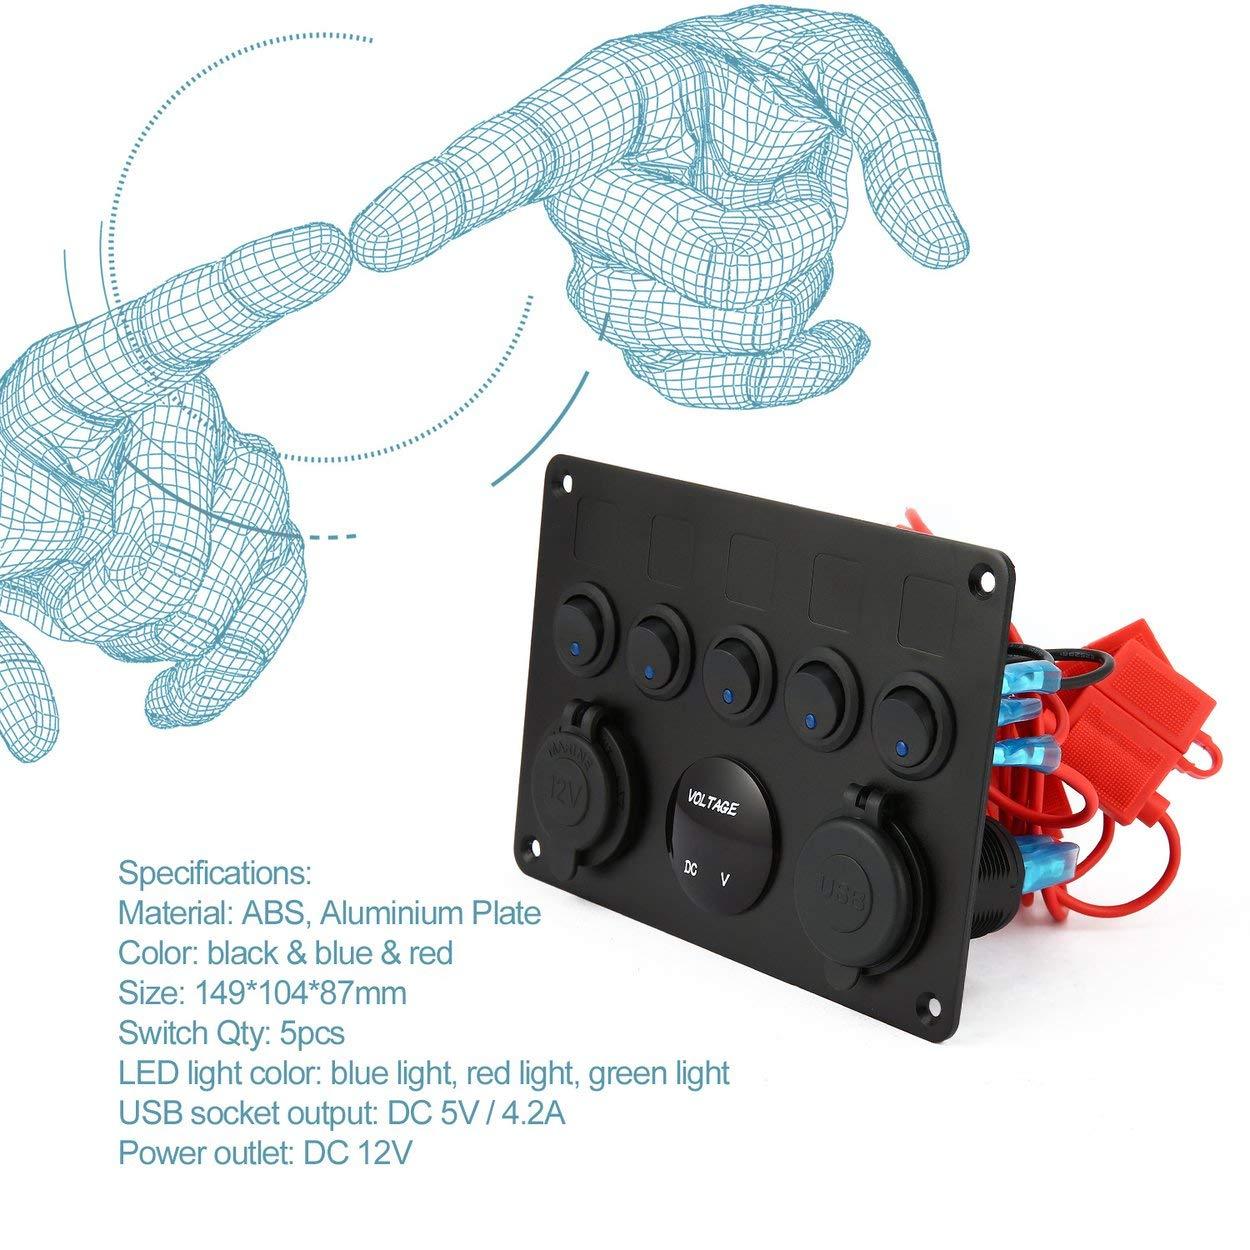 Lorenlli Panel de Control de Interruptor de Palanca ON-Off Profesional de 5 cuadrillas con volt/ímetro Digital 2 Cargador USB 12V para Coche Barco Marino